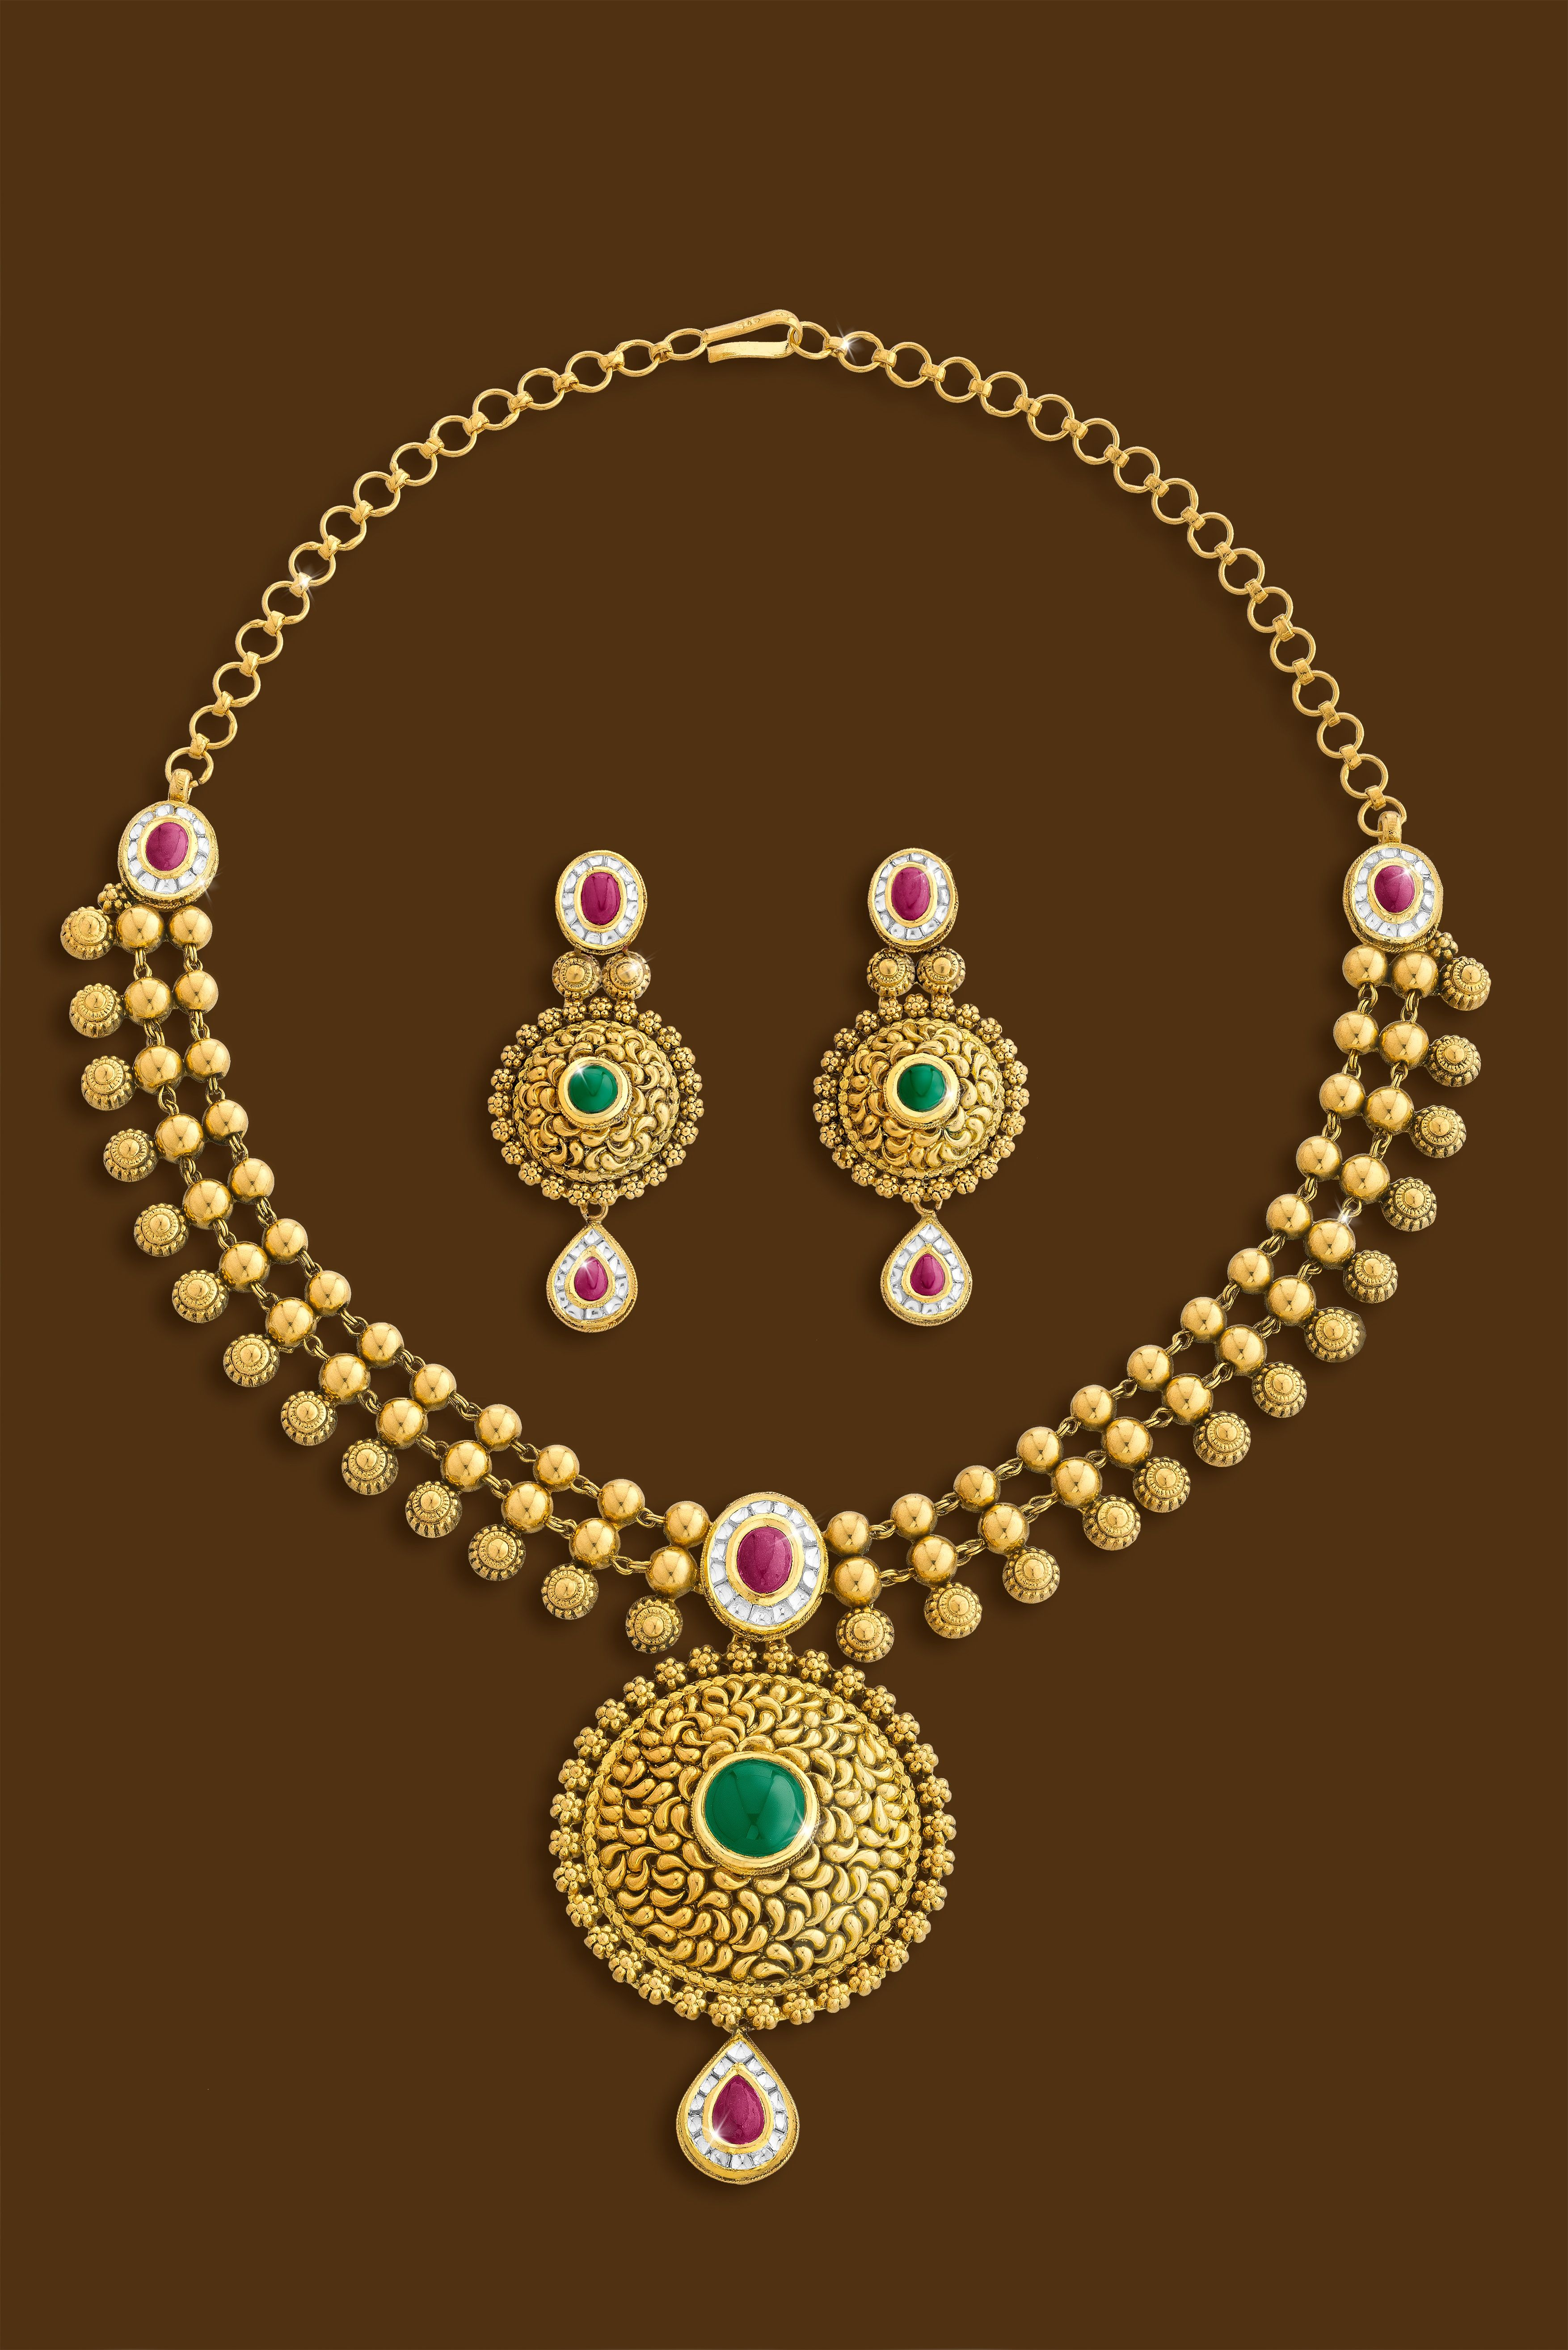 Damas Akshaya Tritiya specials!. This is the Maharani (Great queen ...